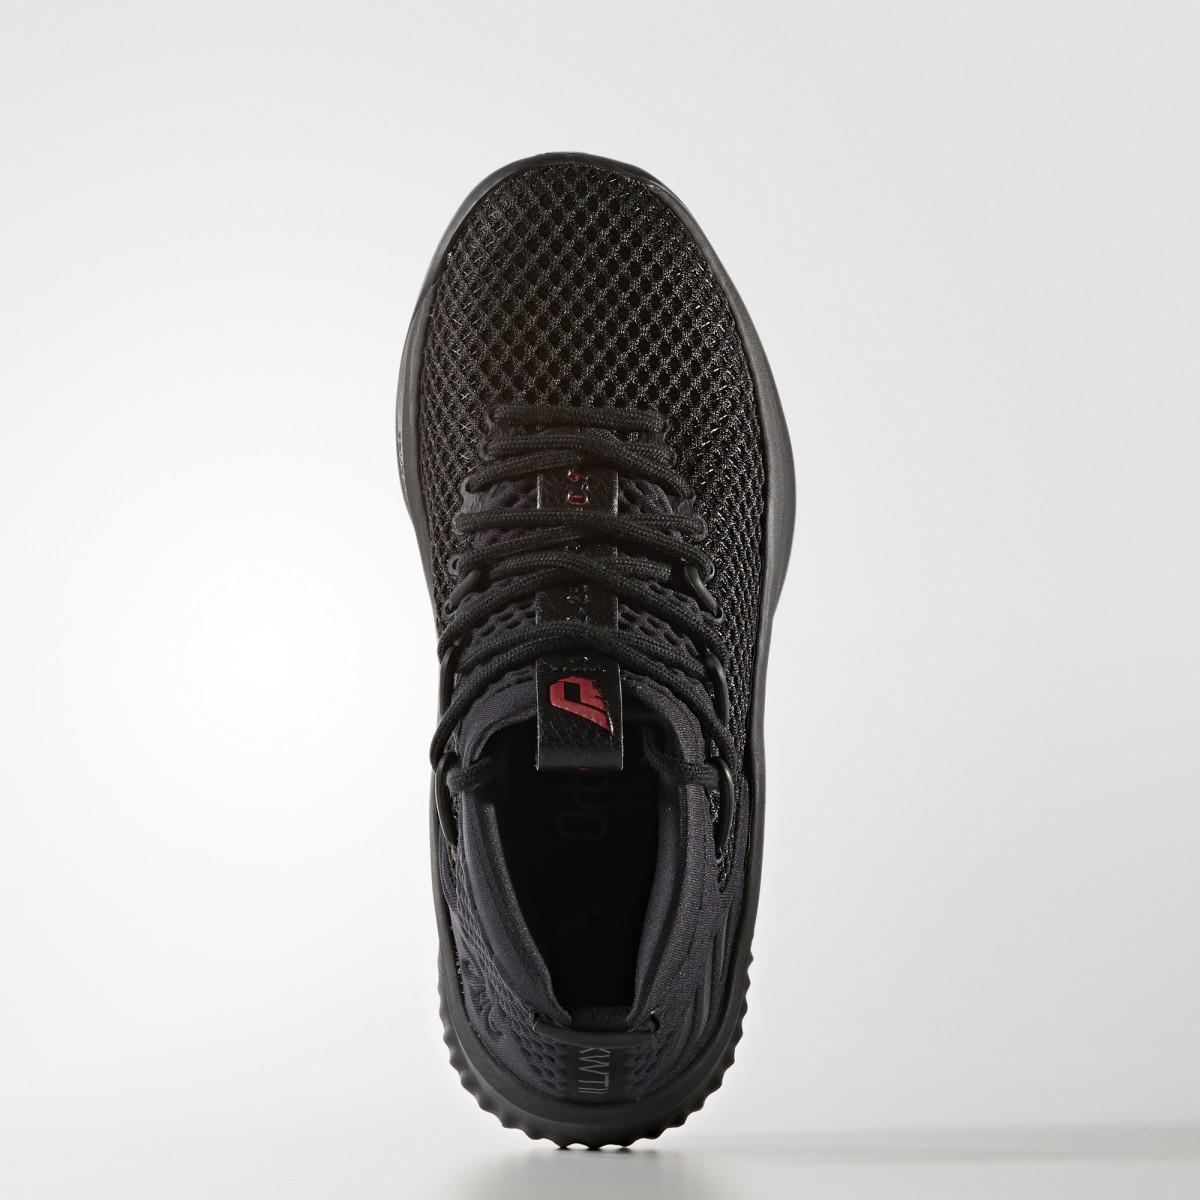 Adidas Dame 4 J 'Black' CG4306